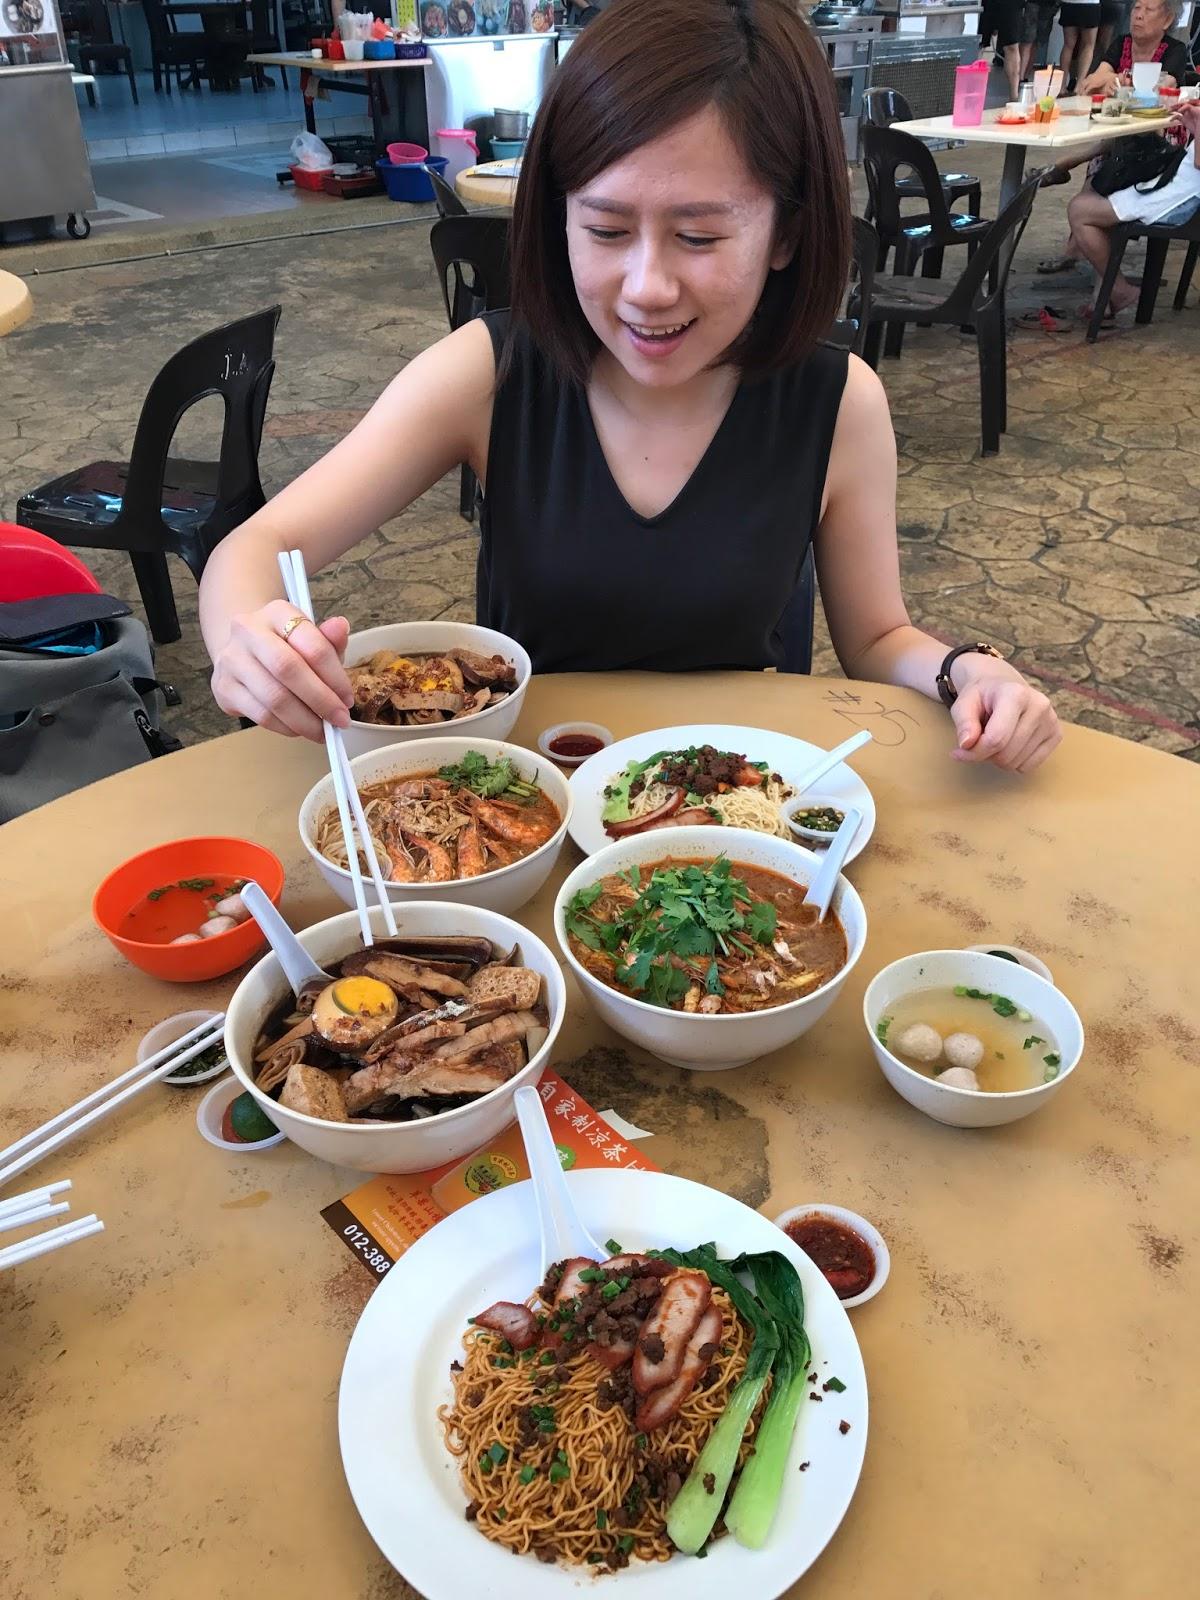 [Food Review] Sarawak Laksa, Kolo Mee, Kueh Chap by Auntie Lan Sarawak Deli @ NZX Food Court, Ara Damansara